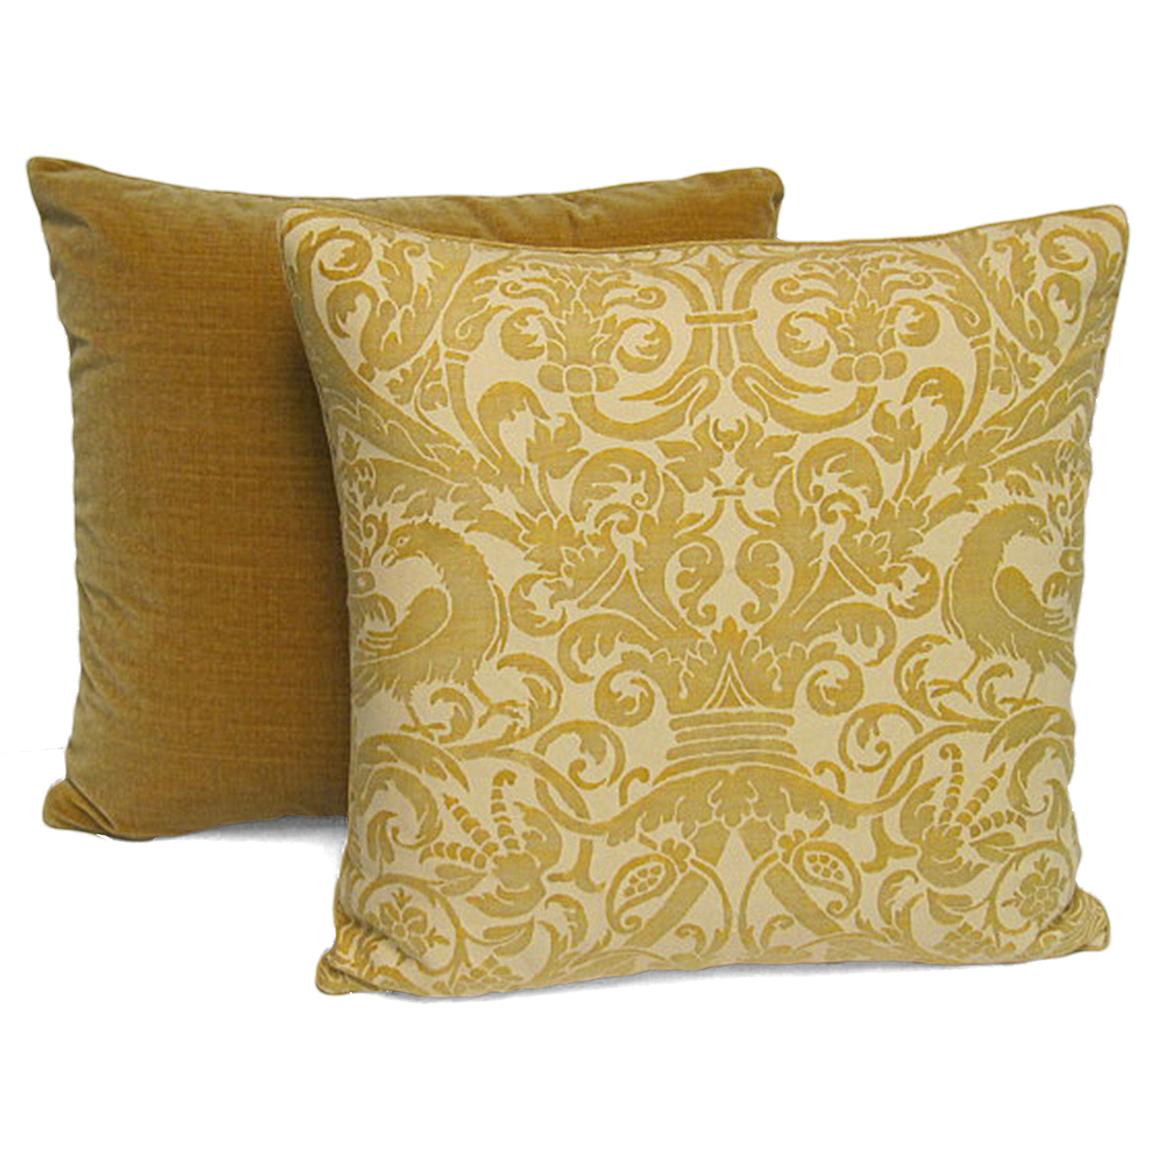 Satin Pillowcase Dublin: Pair Of Handmade Yellow Cotton And Velvet Pillows